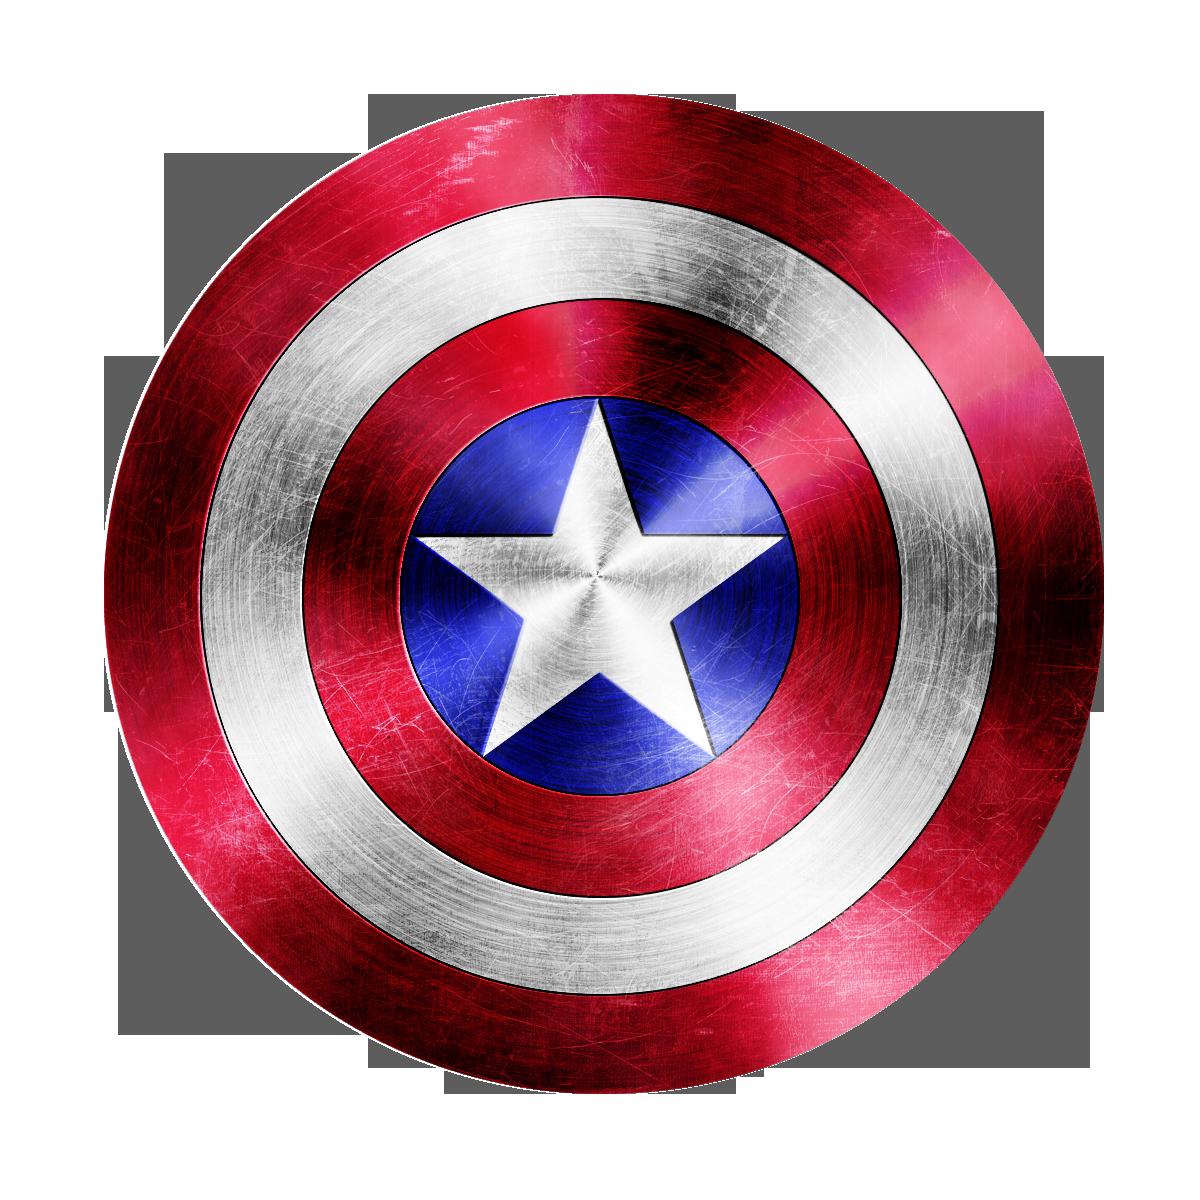 S sheild elbow peice. Clipart shield captain america